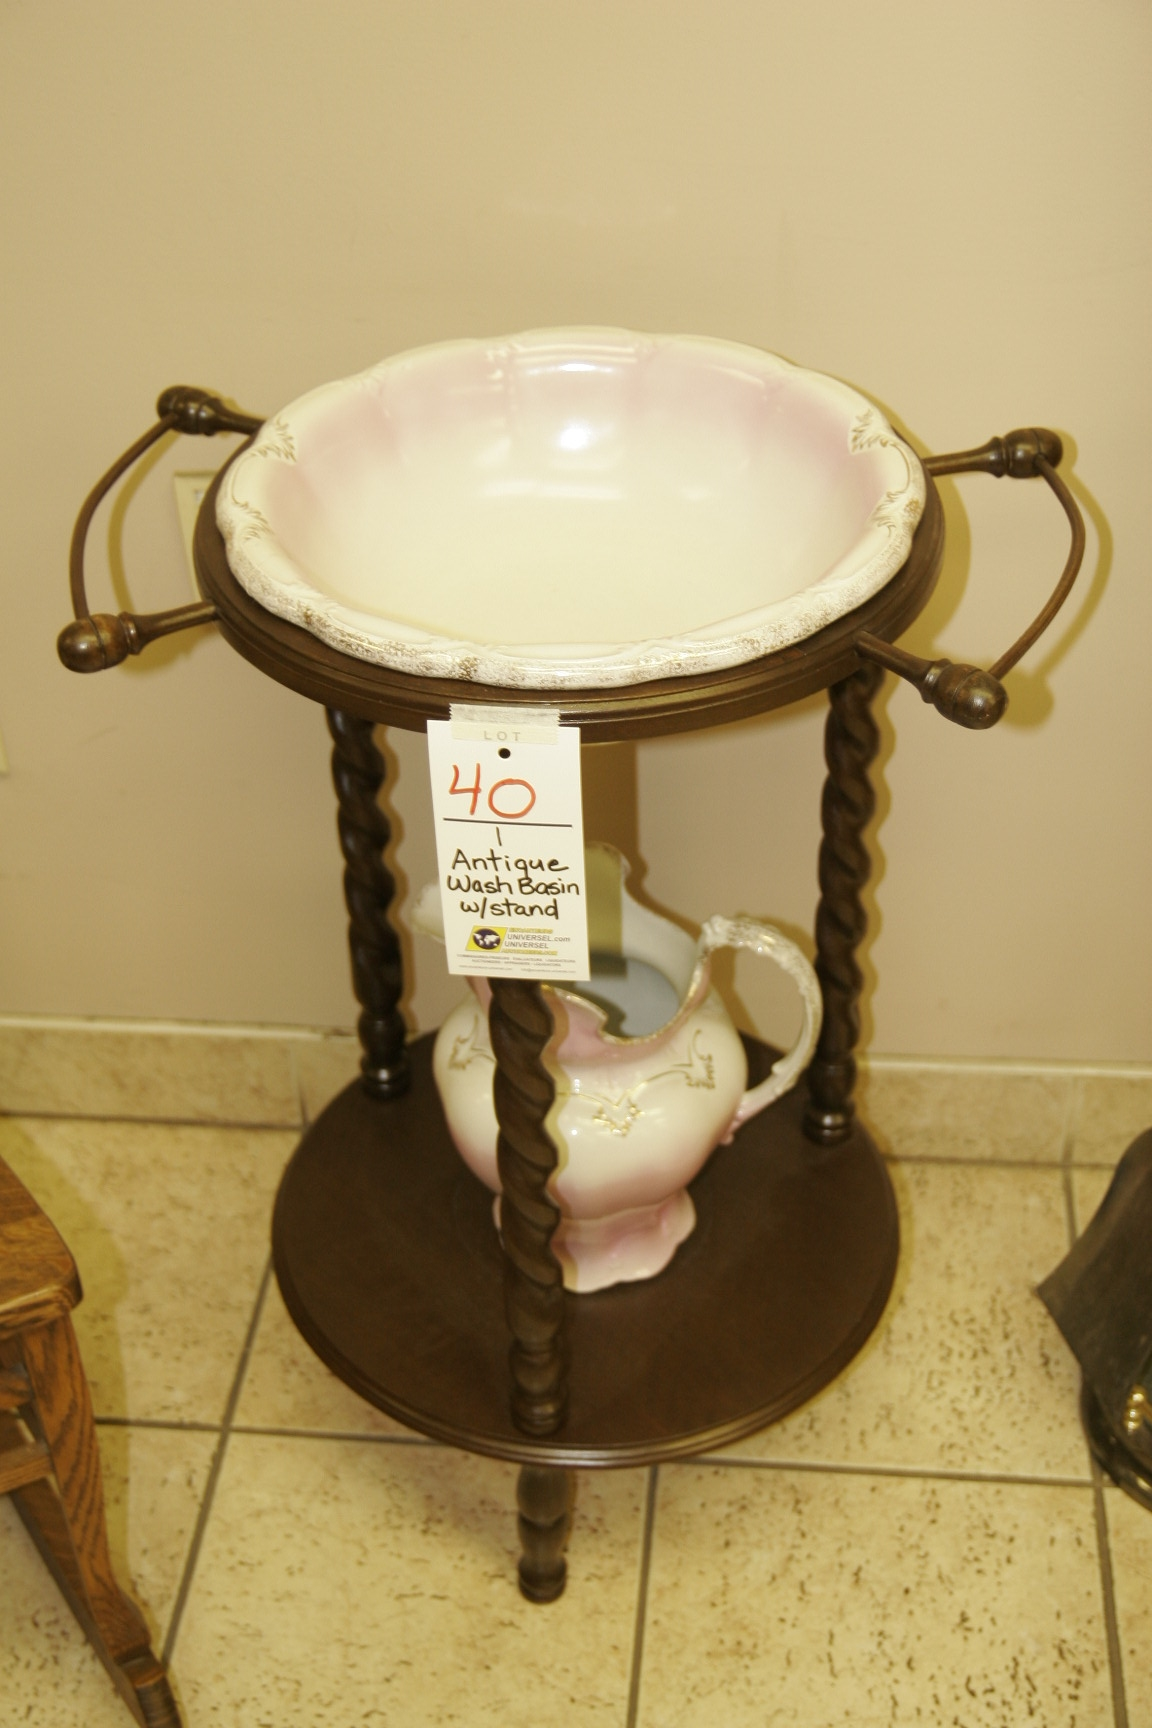 Antique Wash Basin w/Stand